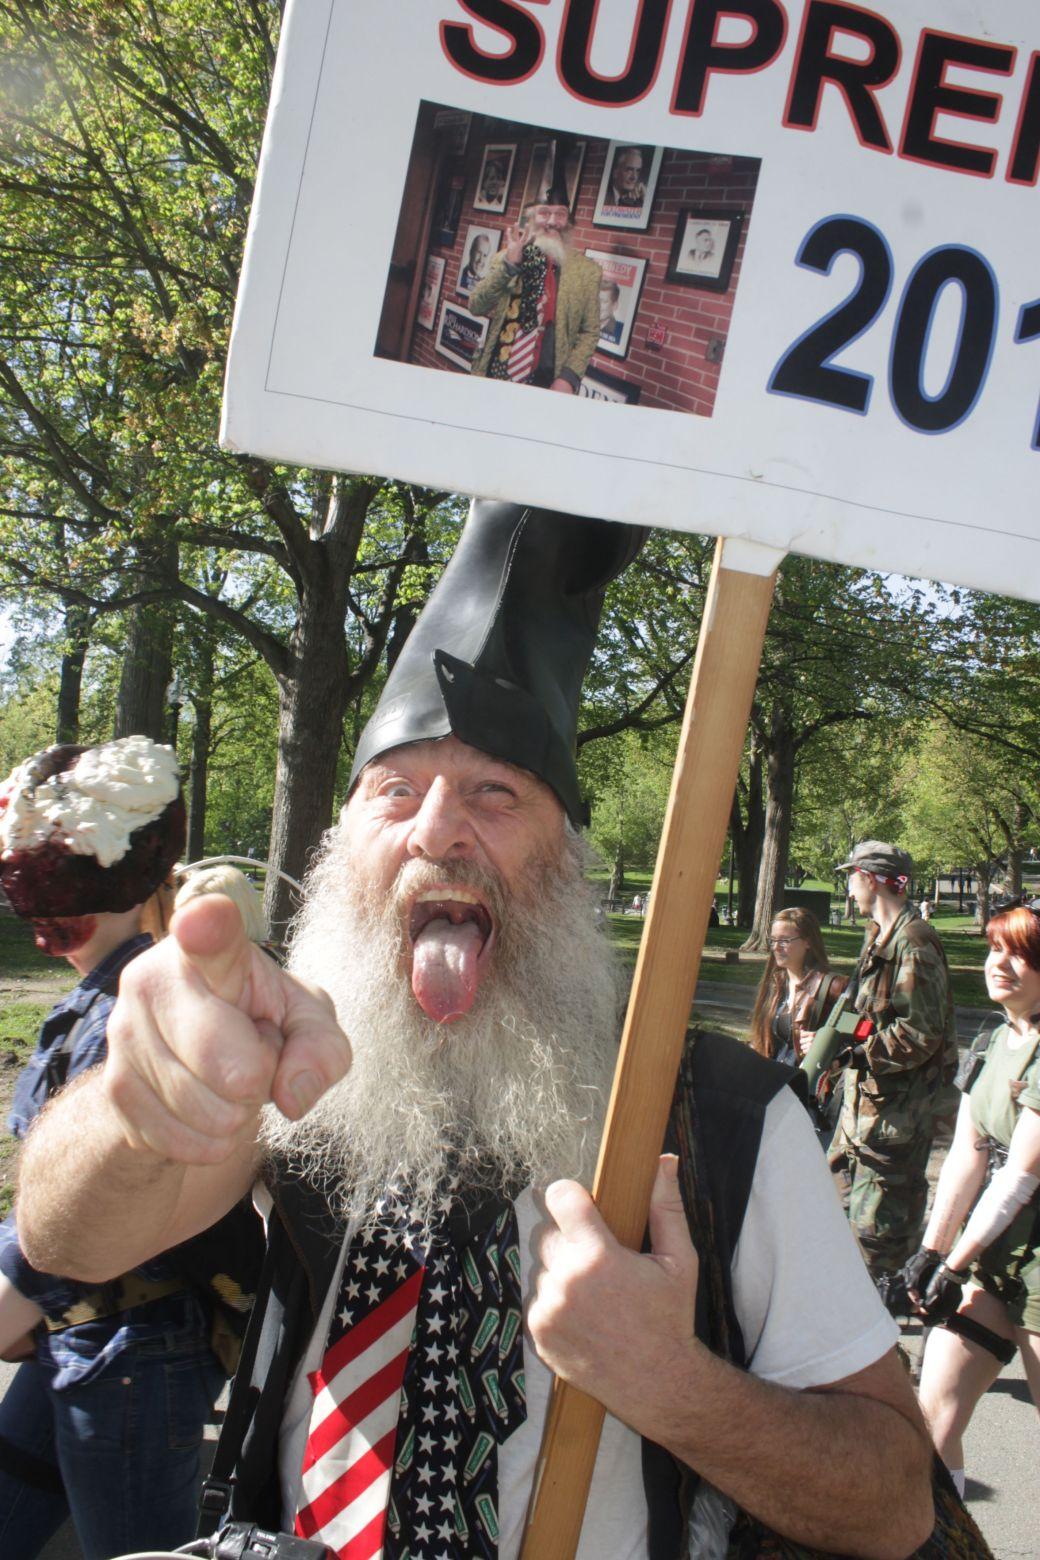 boston zombie walk may 17 vermin supreme